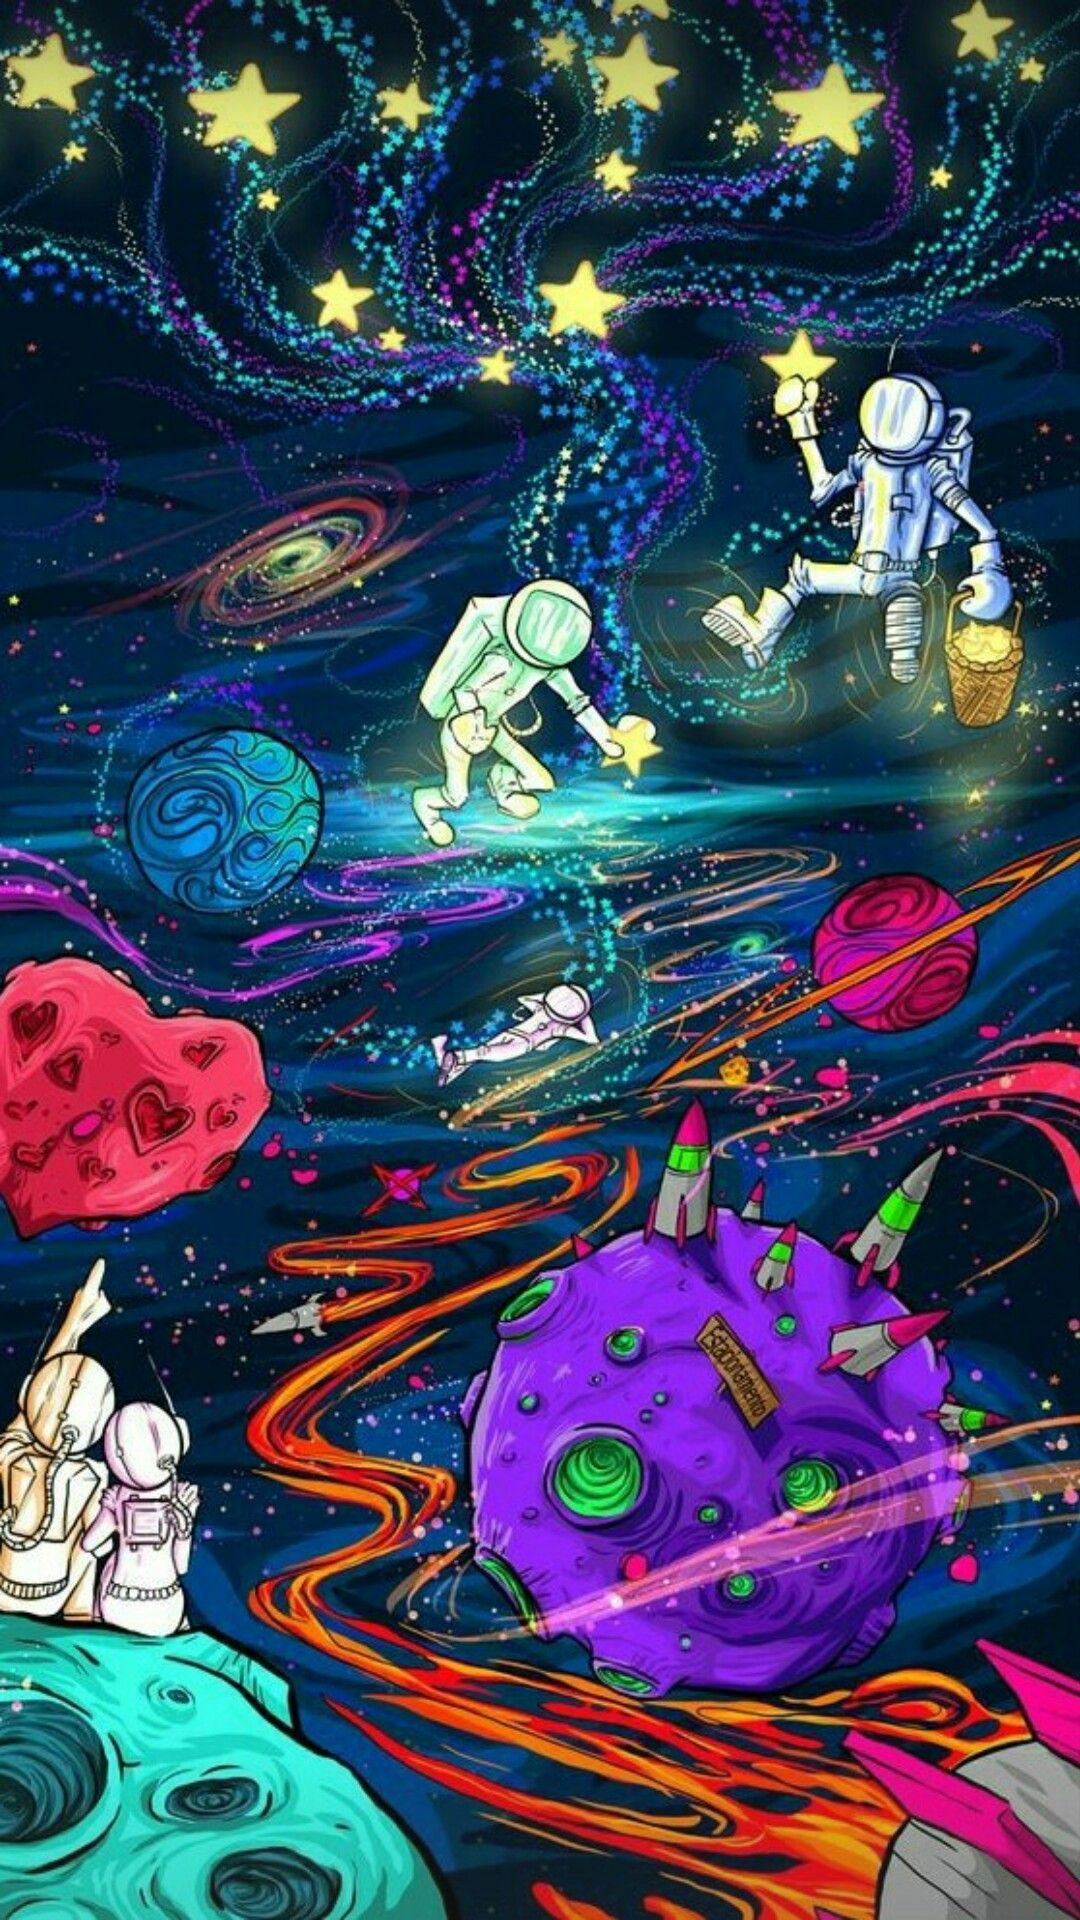 Wonderful Wallpaper Halloween Trippy - 587765389964ba04899f36762f30d250  You Should Have_594299.jpg